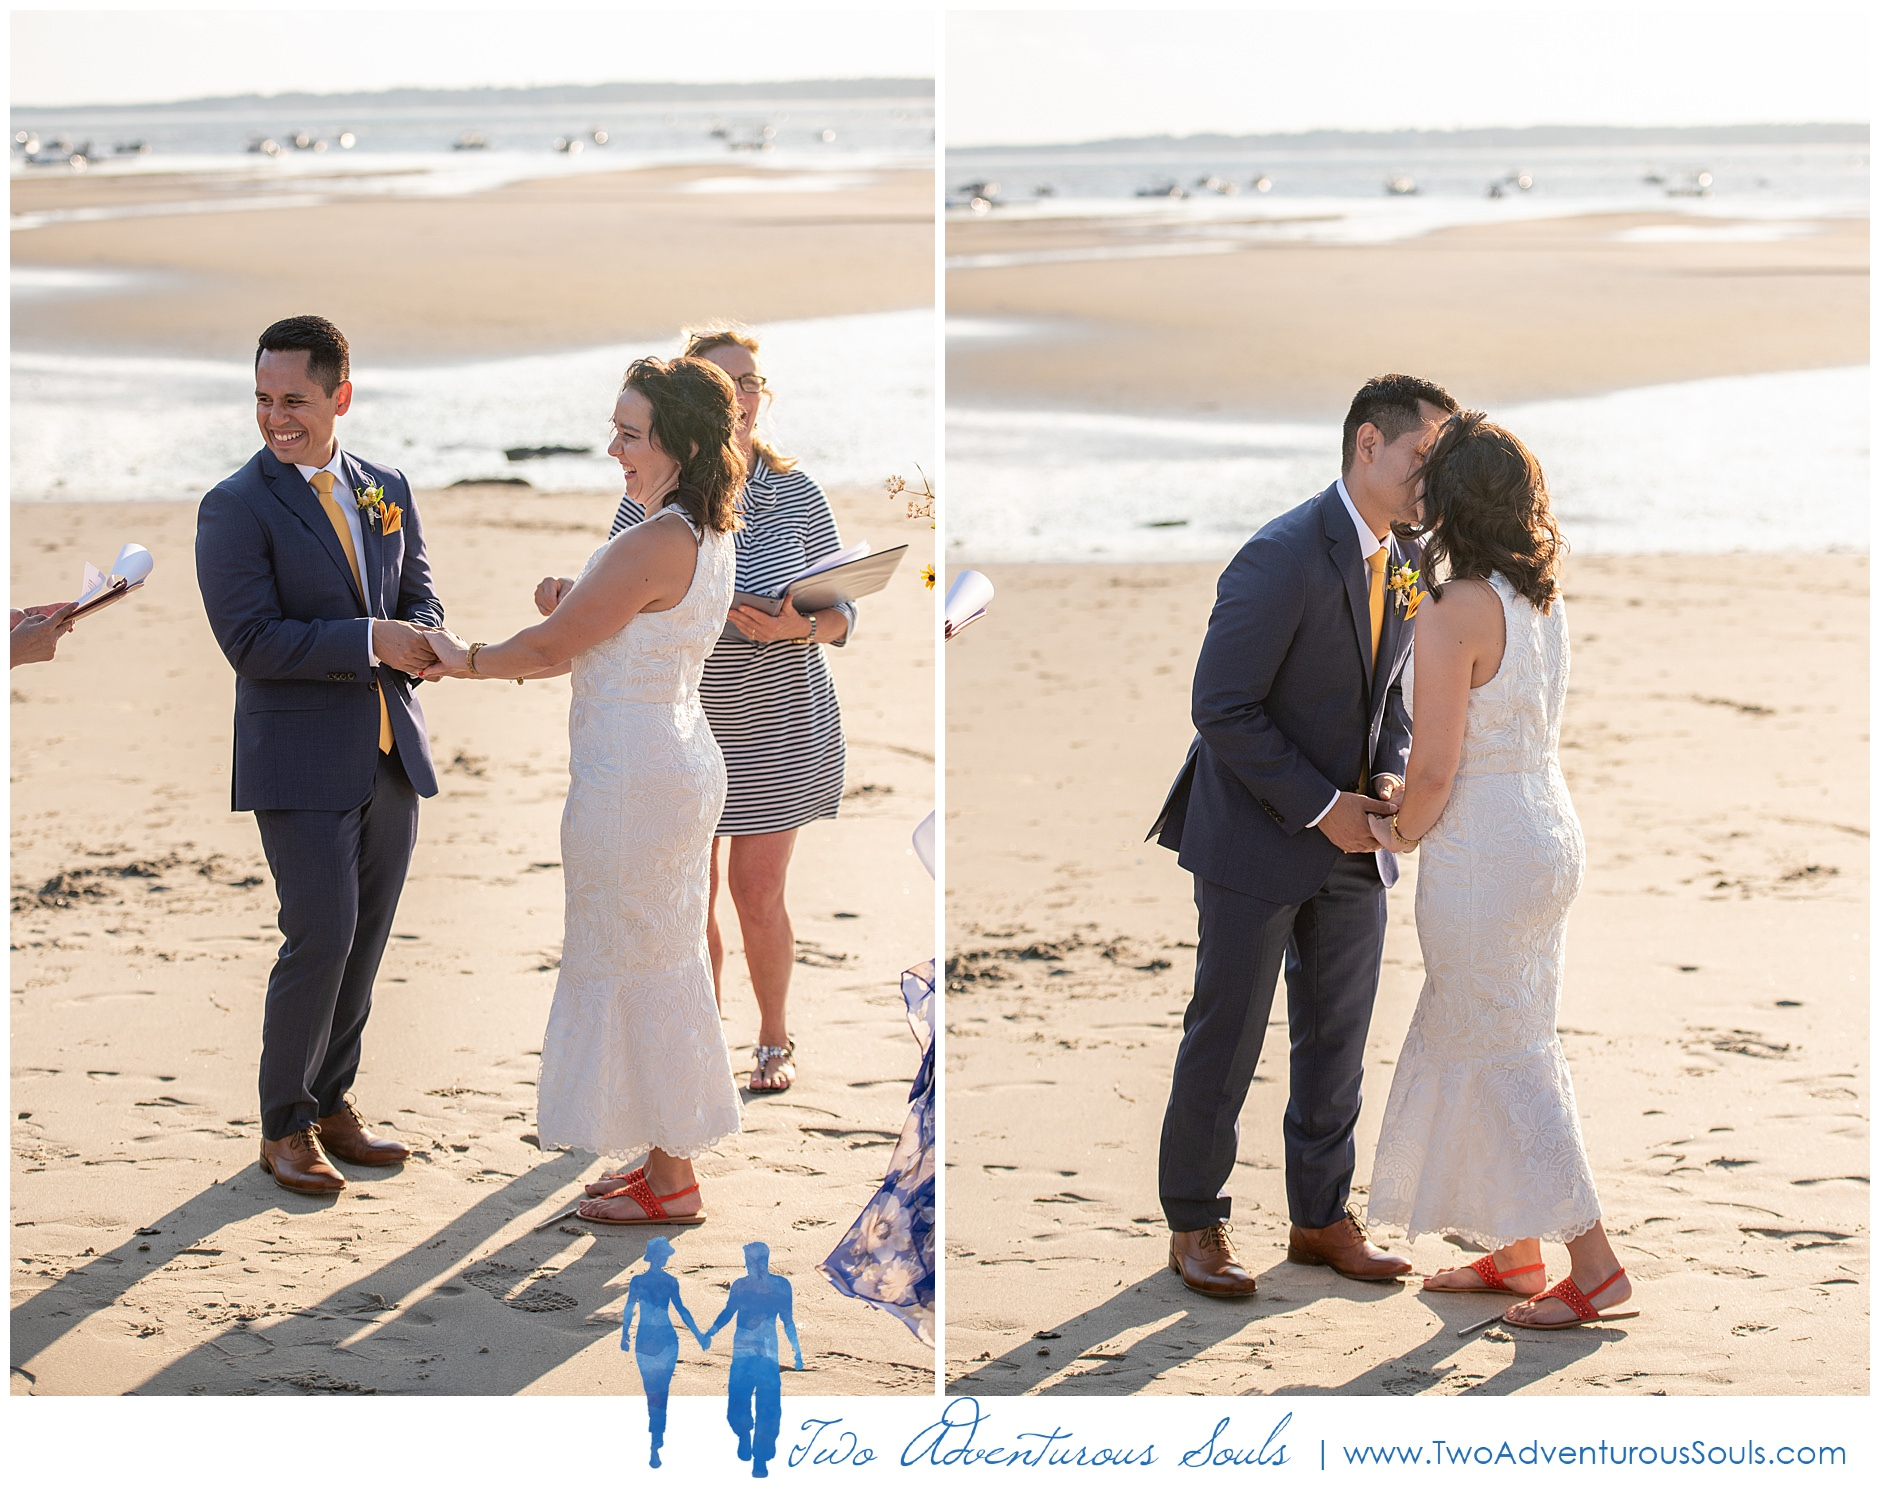 Black Point Inn Wedding Photographers, Scarborough Wedding Photographers, Two Adventurous Souls- 083019_0006.jpg